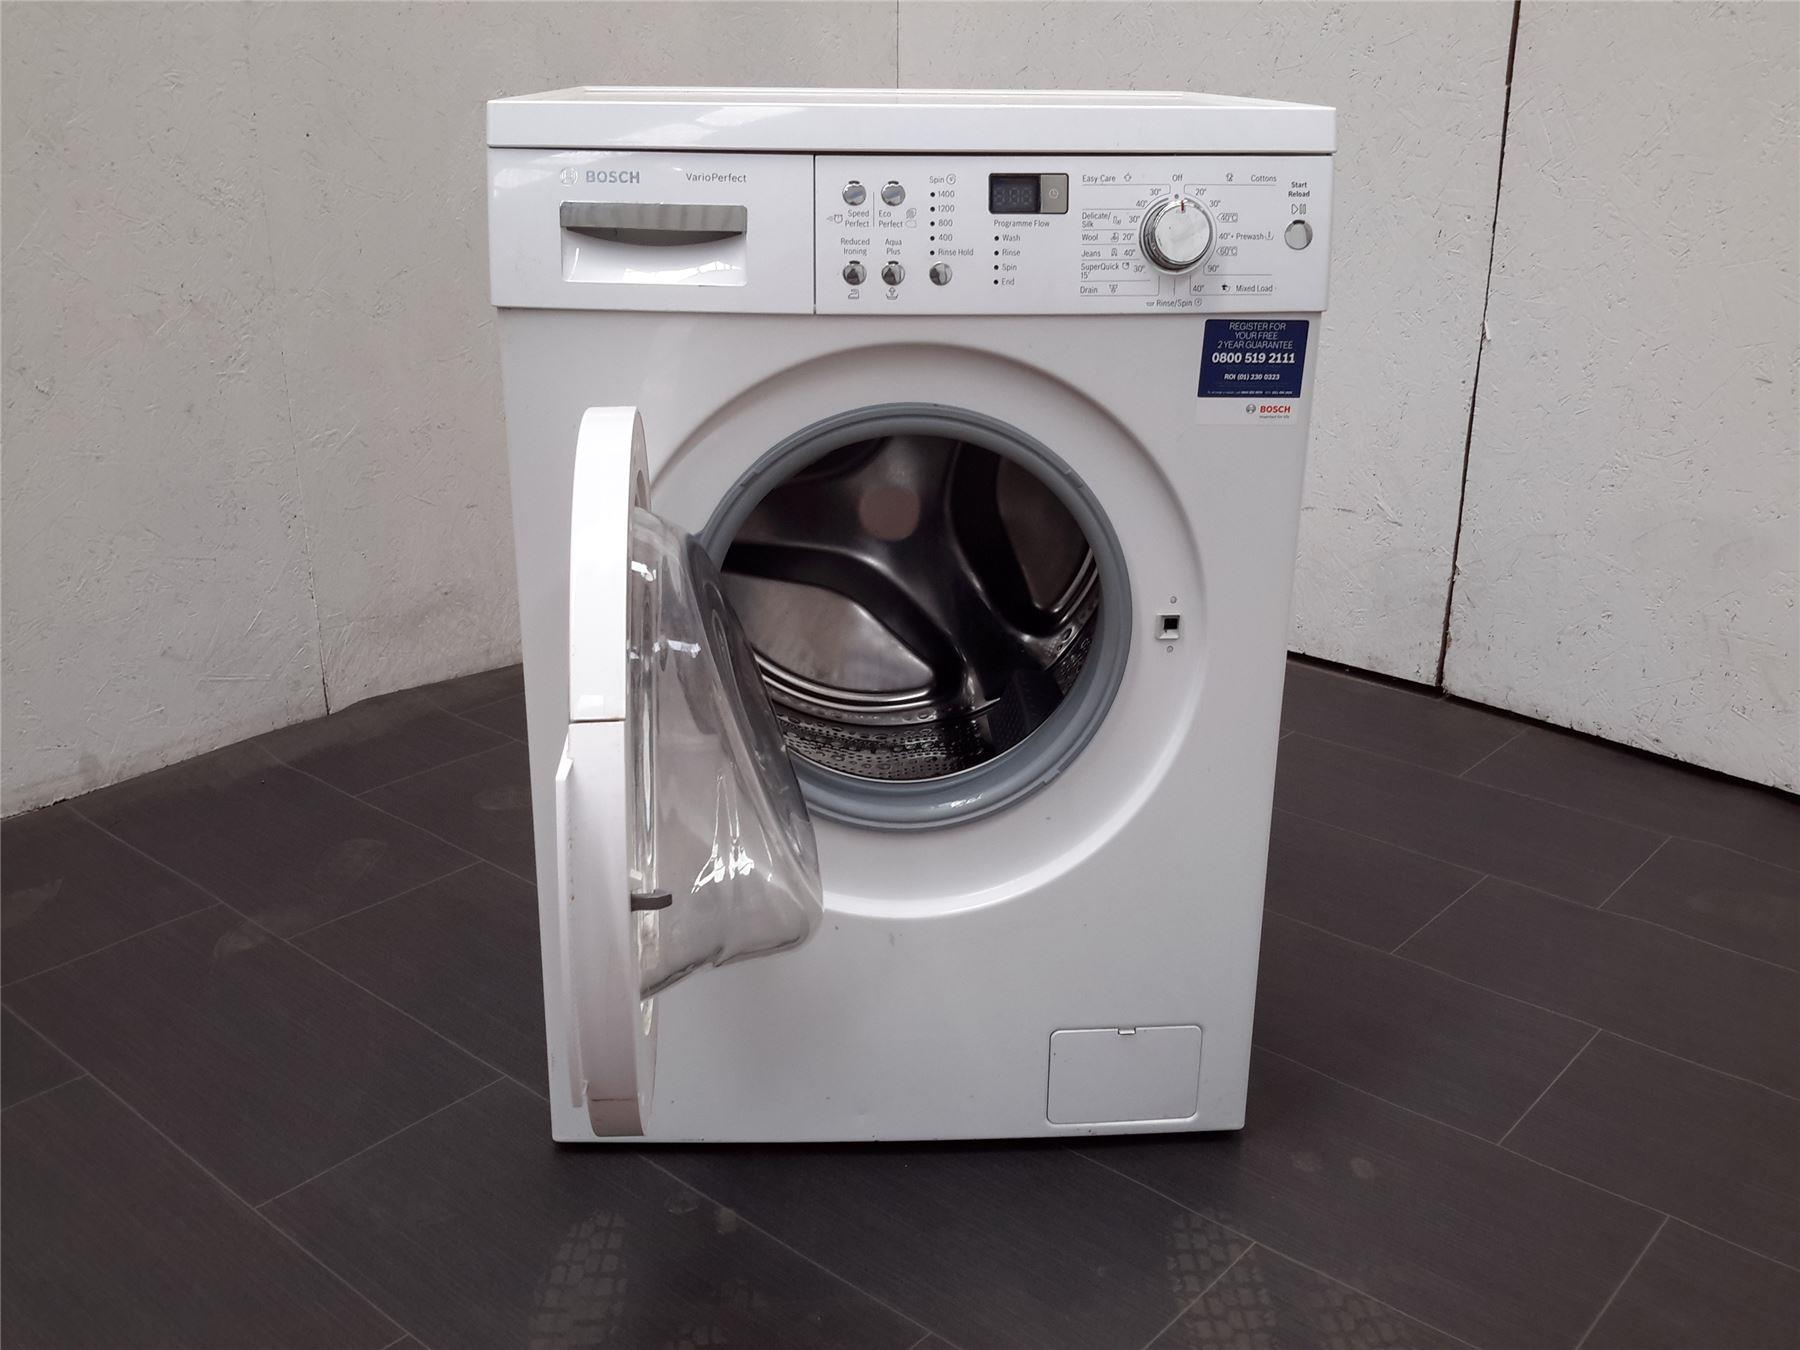 bosch waq283s0gb freestanding 8kg capacity washing machine. Black Bedroom Furniture Sets. Home Design Ideas